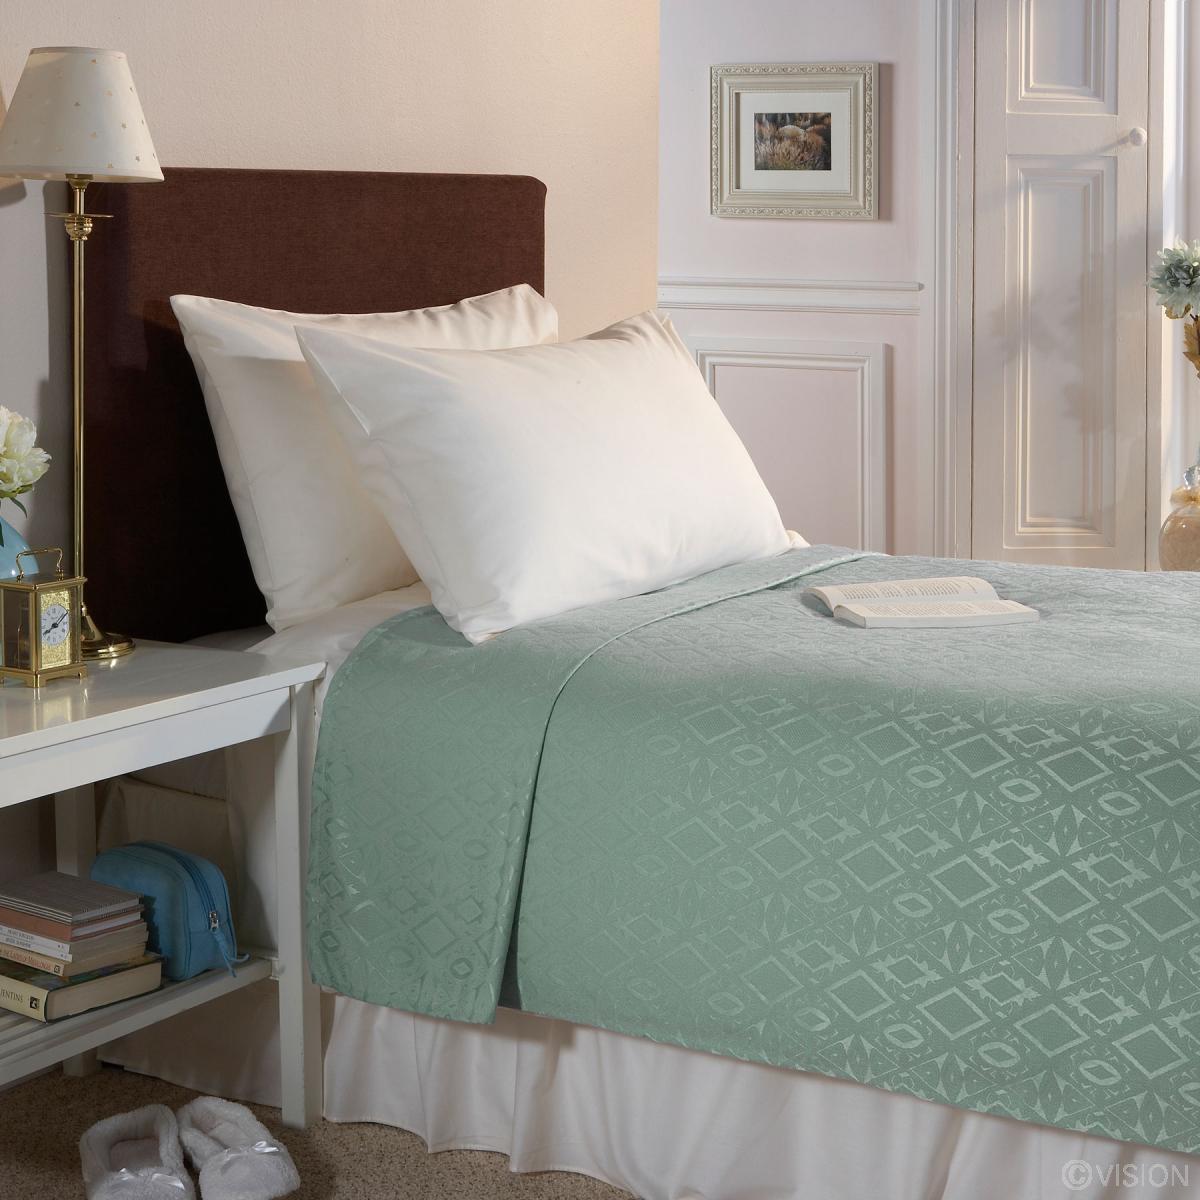 Buy Fire Retardant Blankets Polyester In Cream Or Green